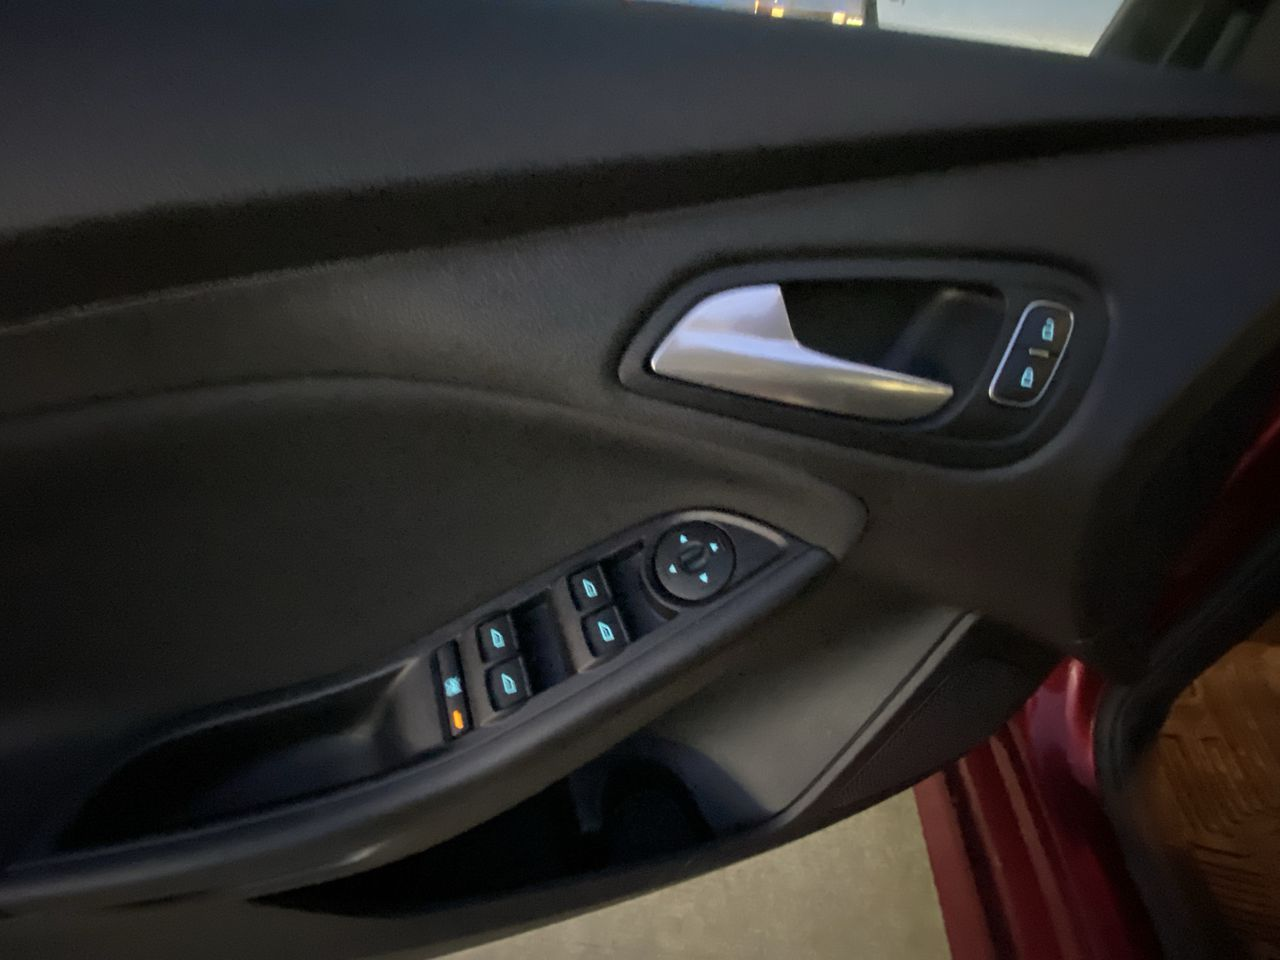 2017 Ford Focus SE Hatch  - Low Mileage